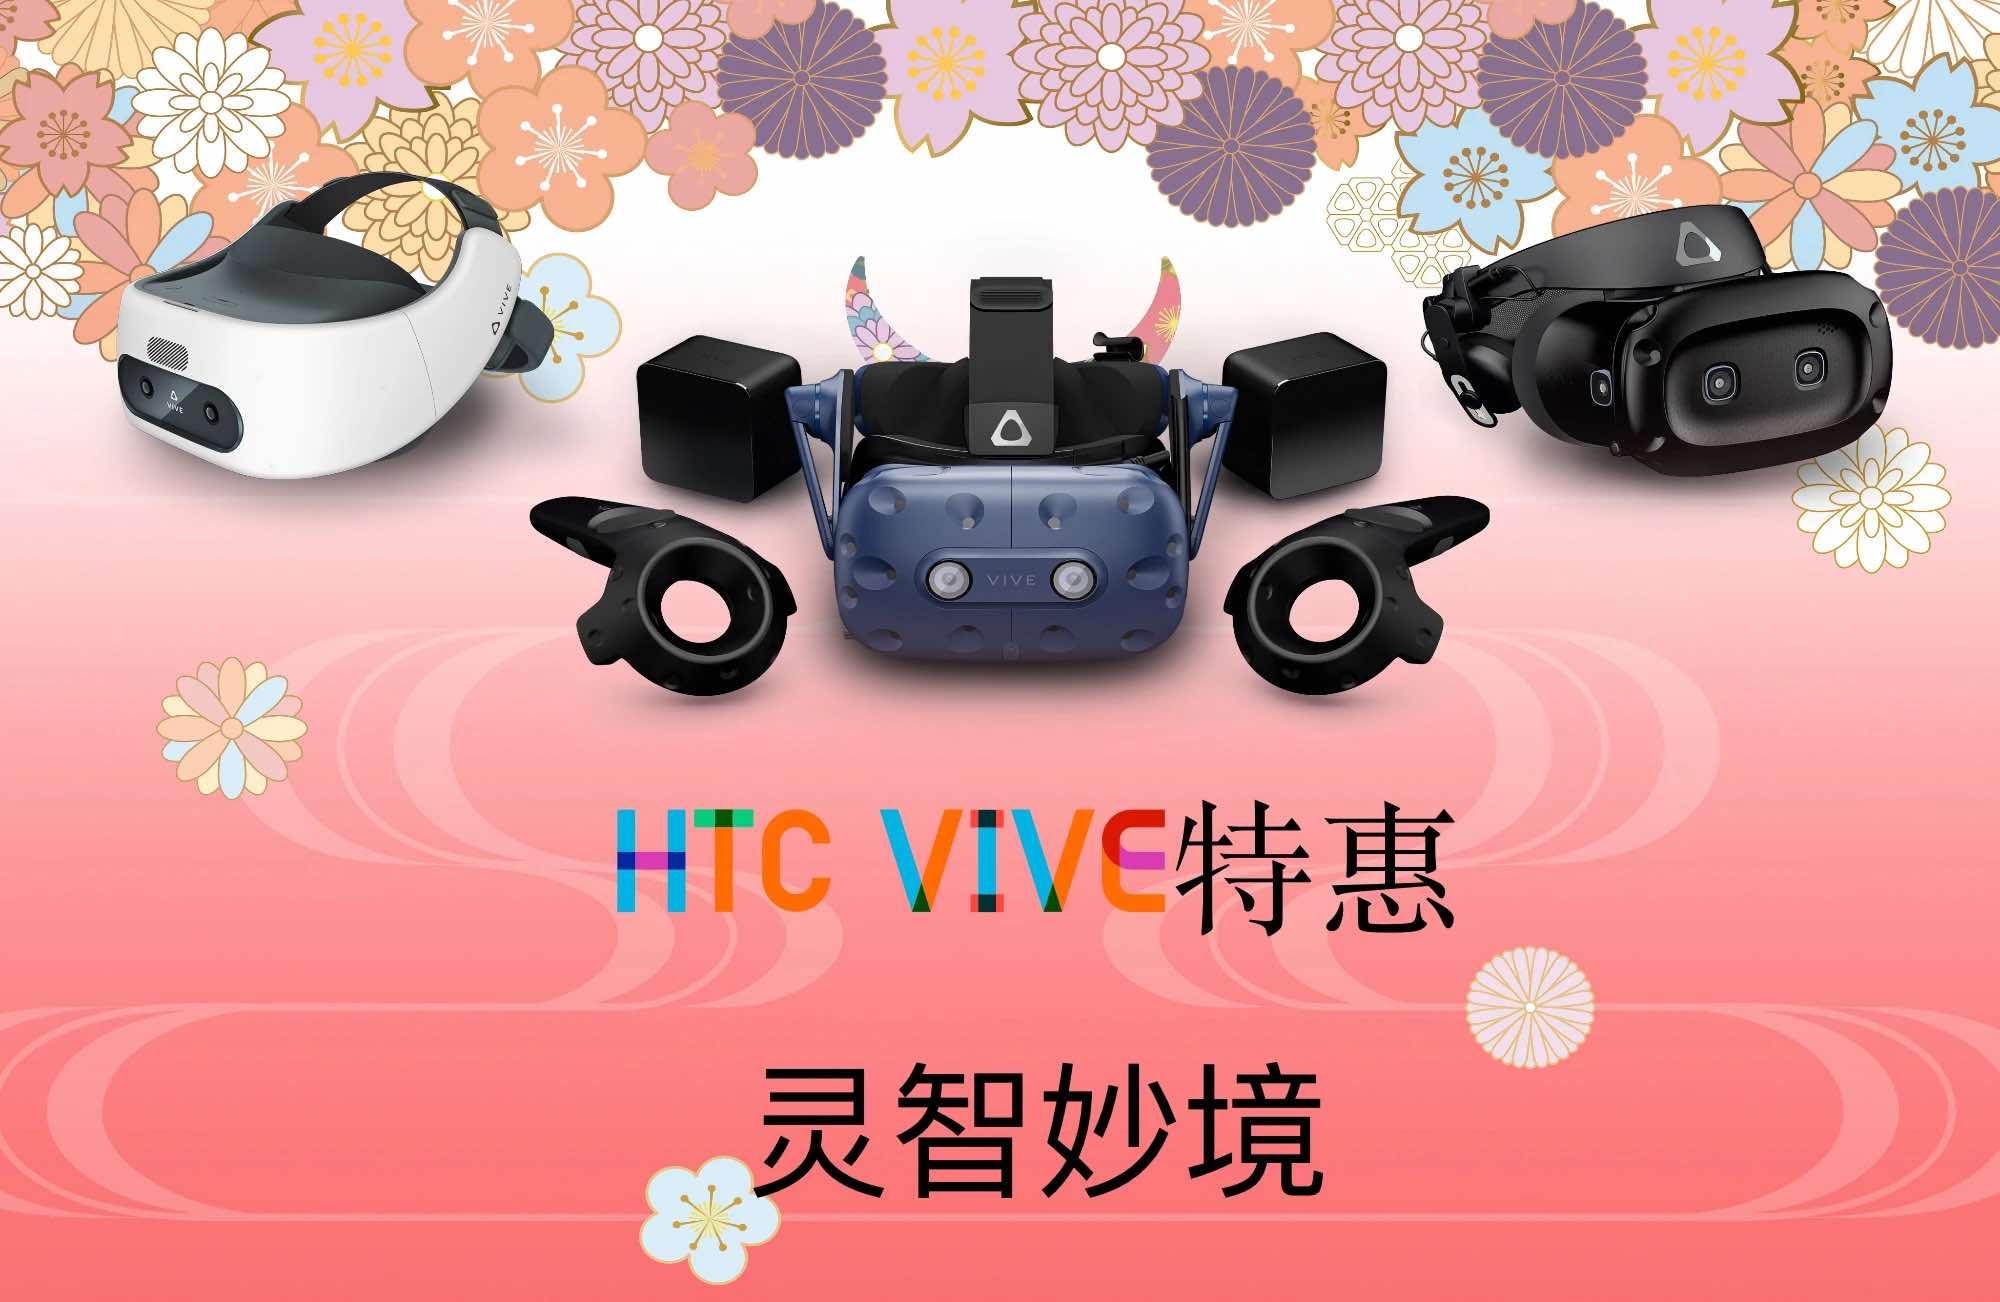 HTC VIVE系列优惠报价